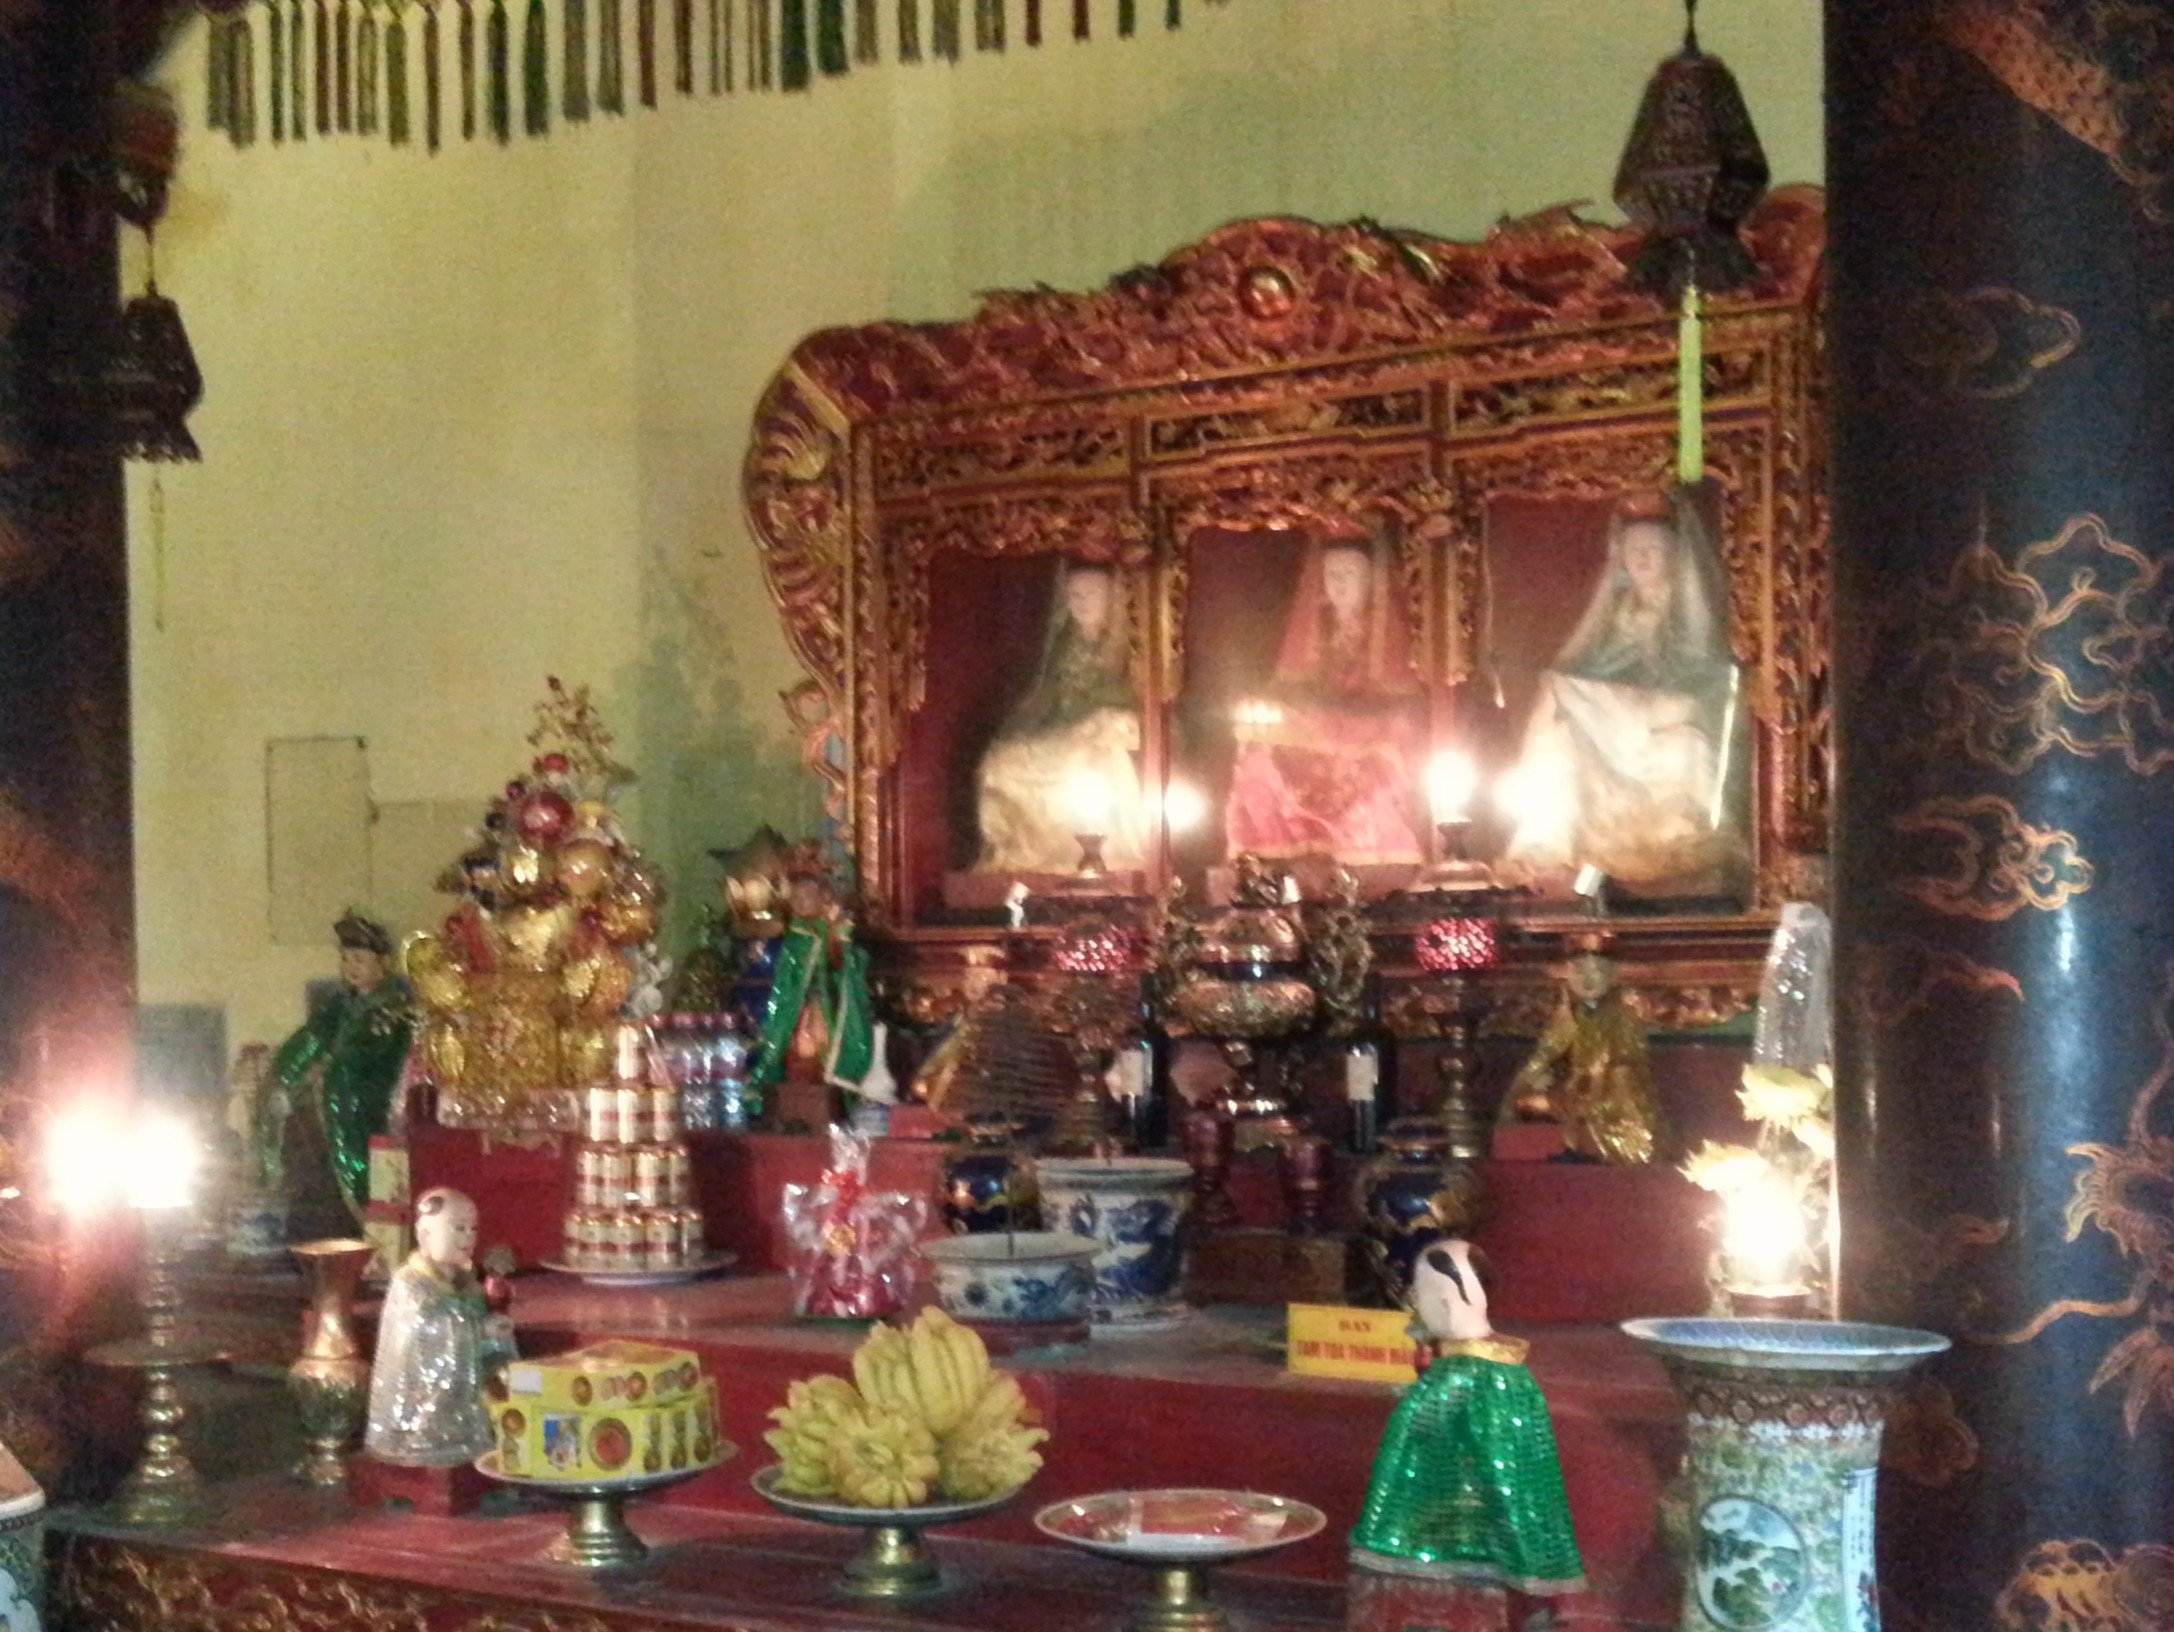 Shrine to Mẫu Thoải